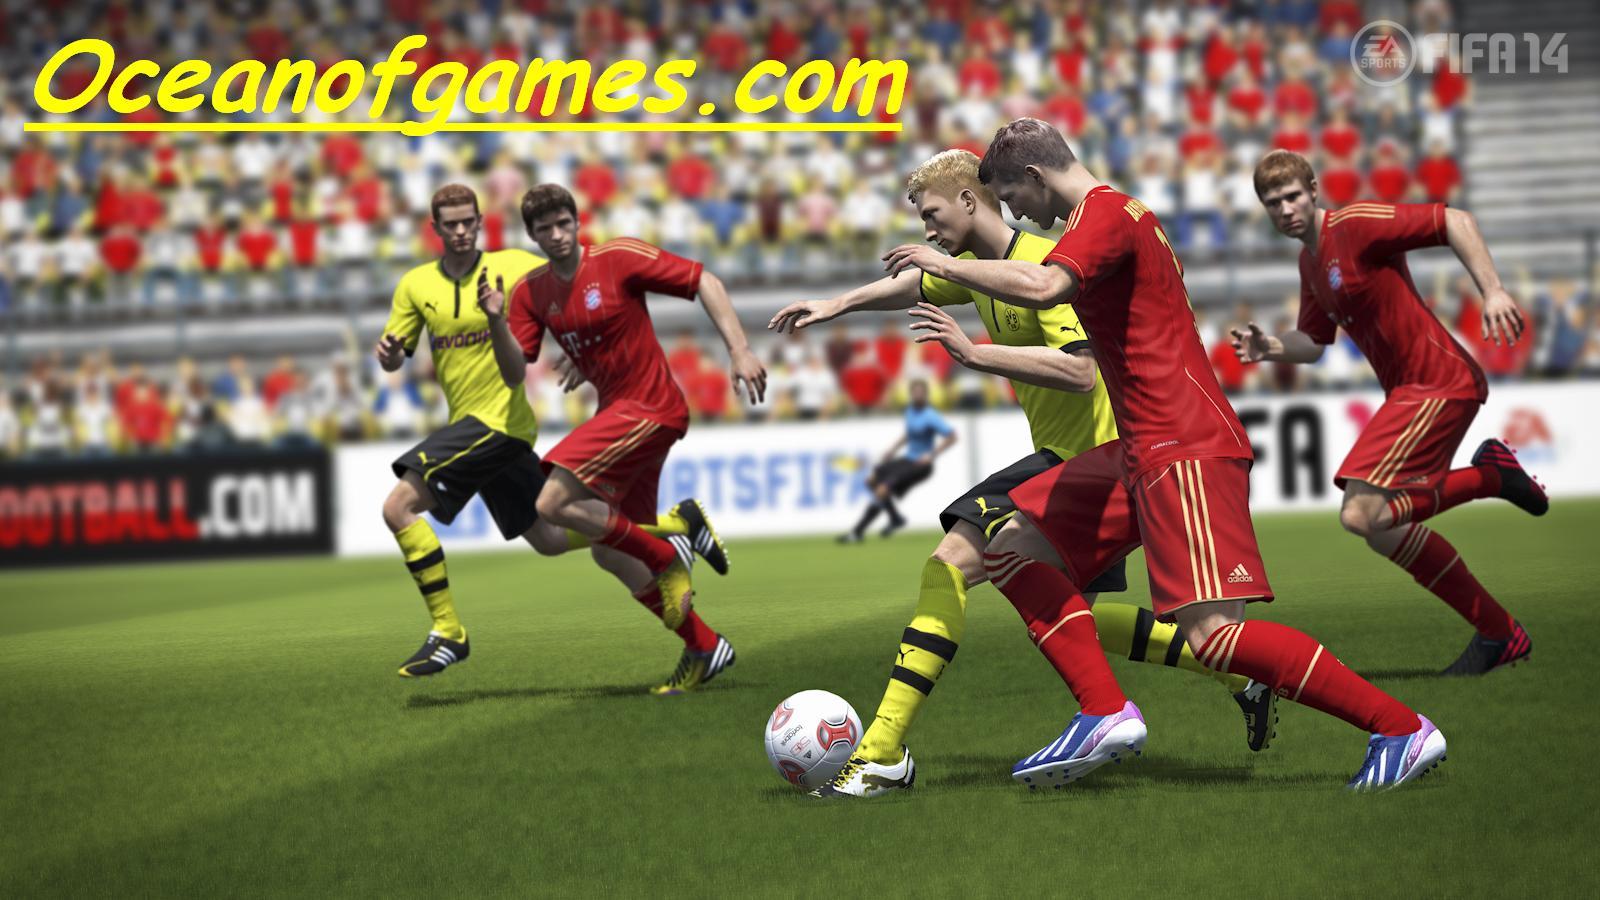 Fifa 14 for mac torrent download